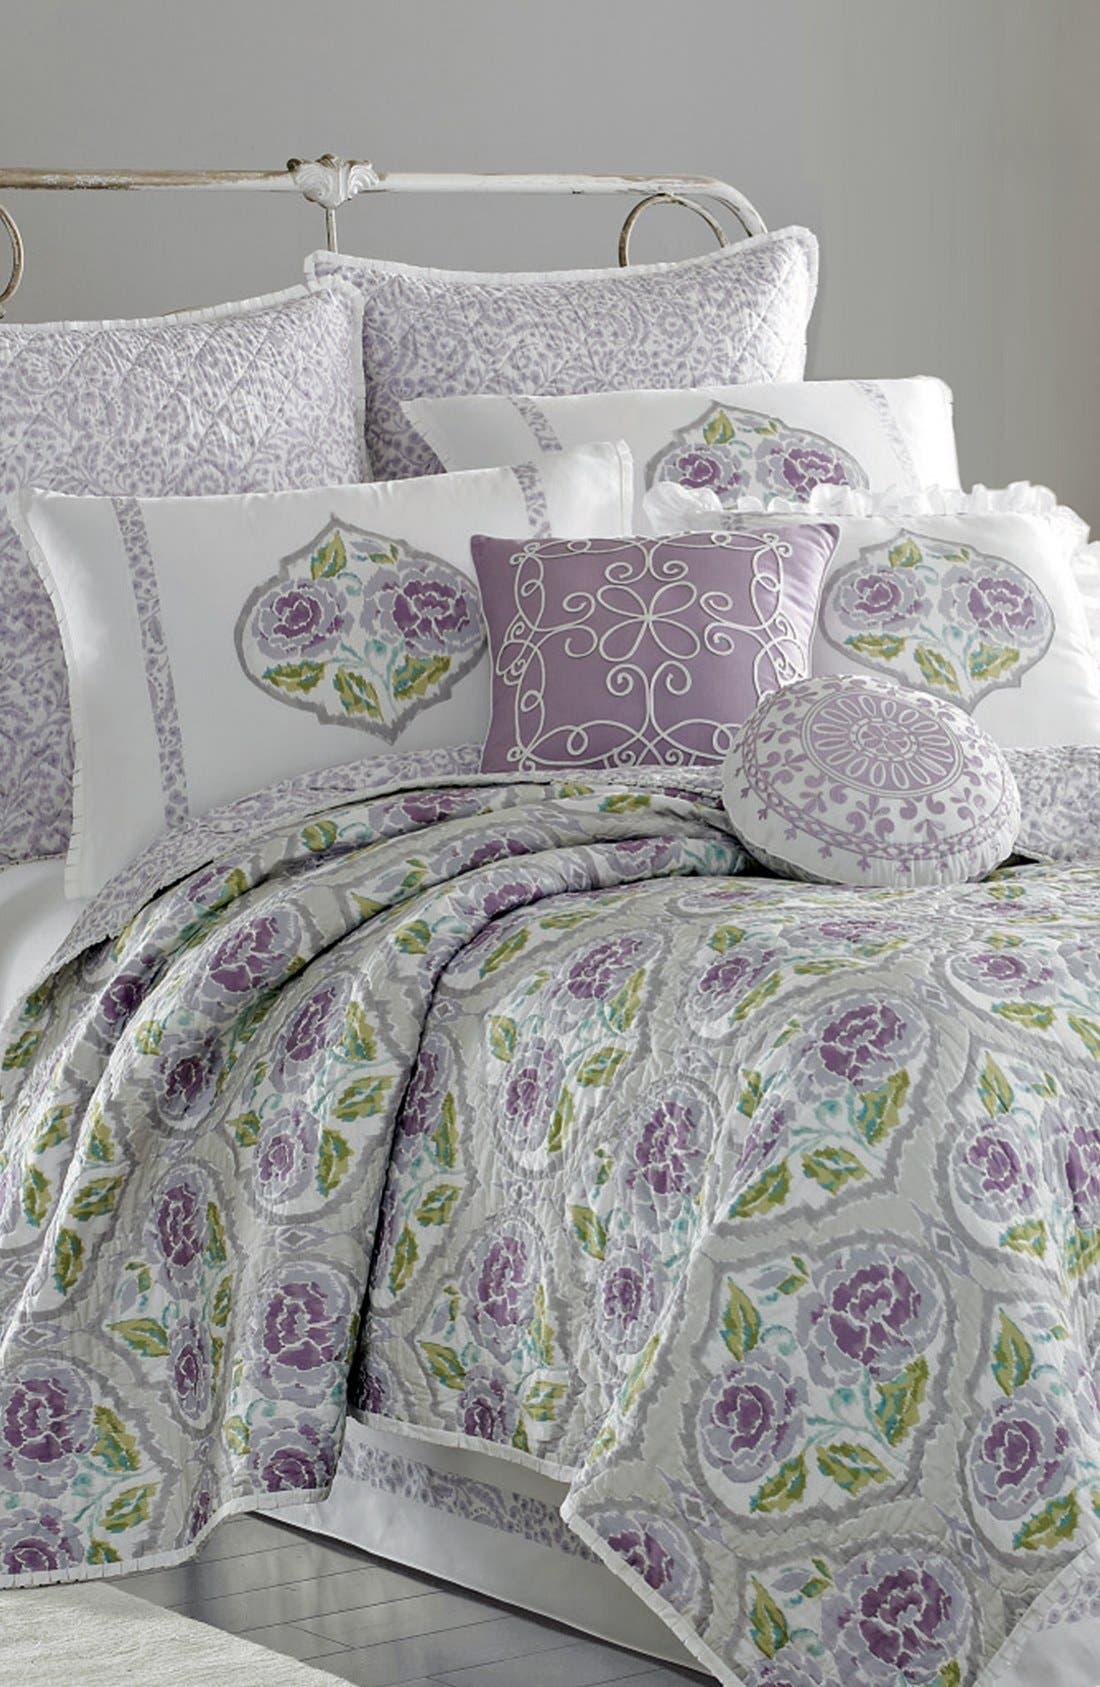 Alternate Image 1 Selected - Dena Home 'French Lavender' Quilt